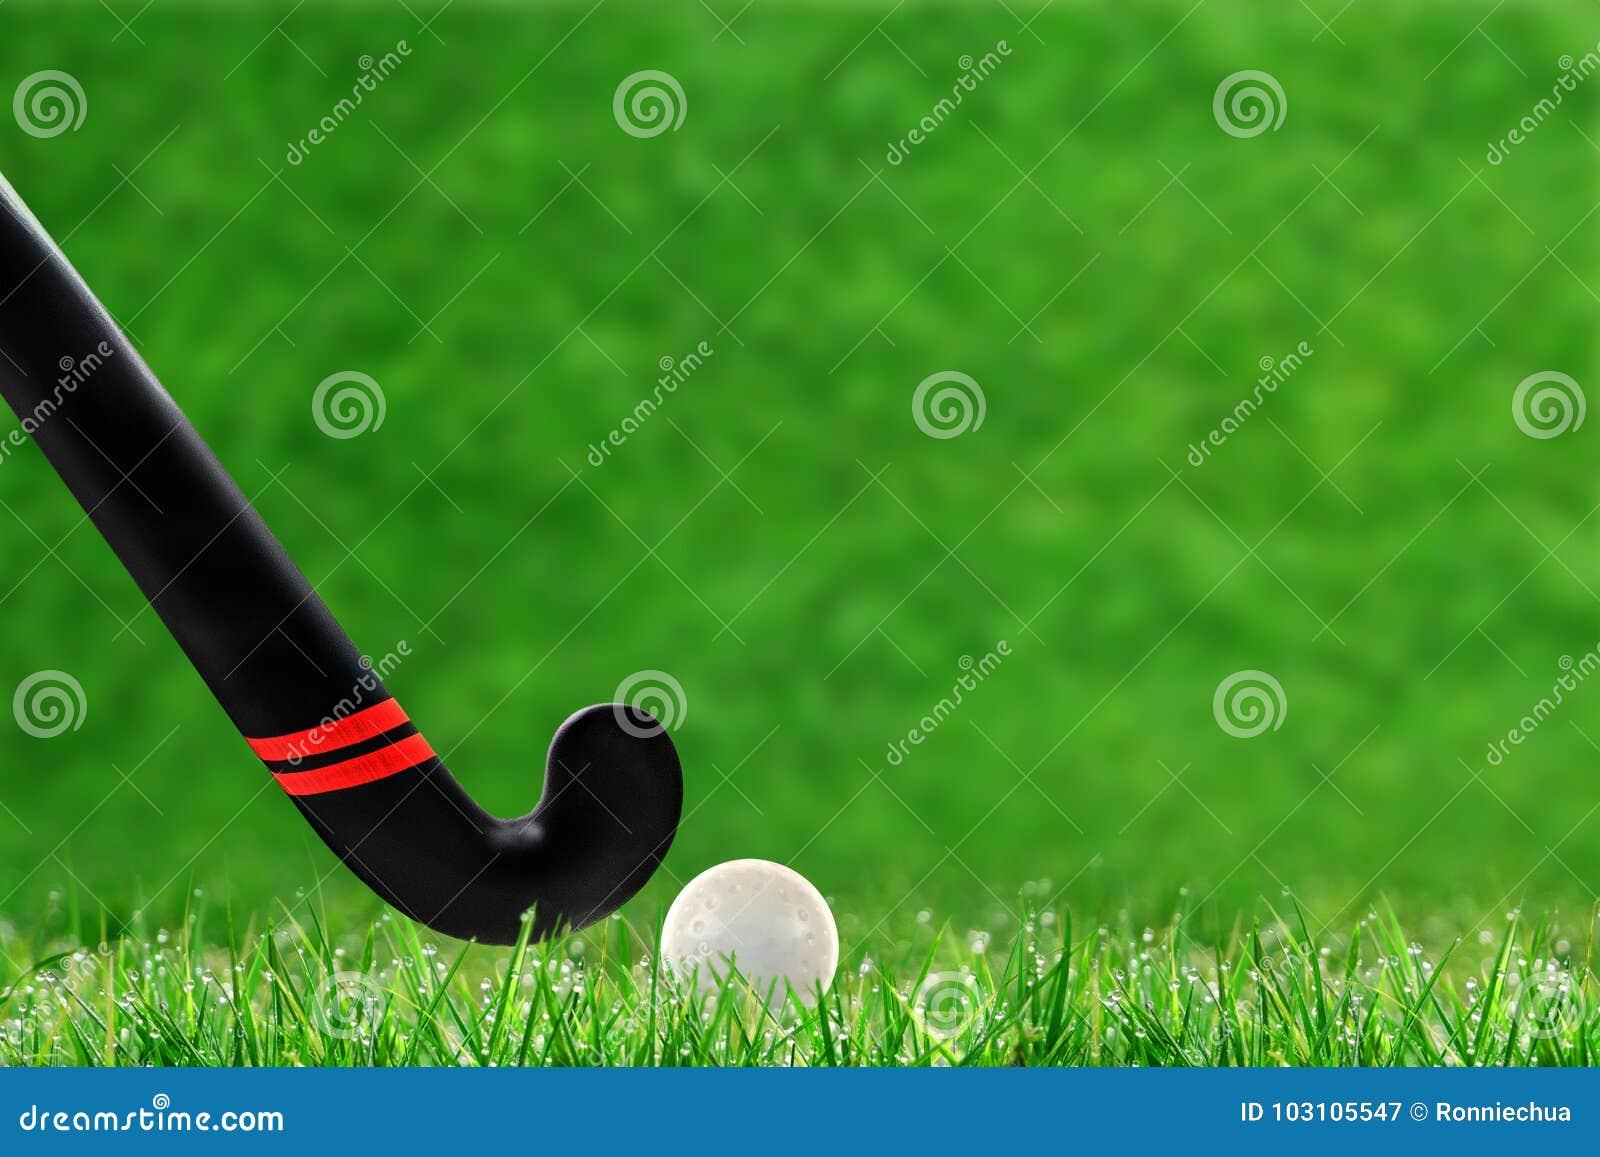 Ручка и шарик хоккея на траве на траве с космосом экземпляра